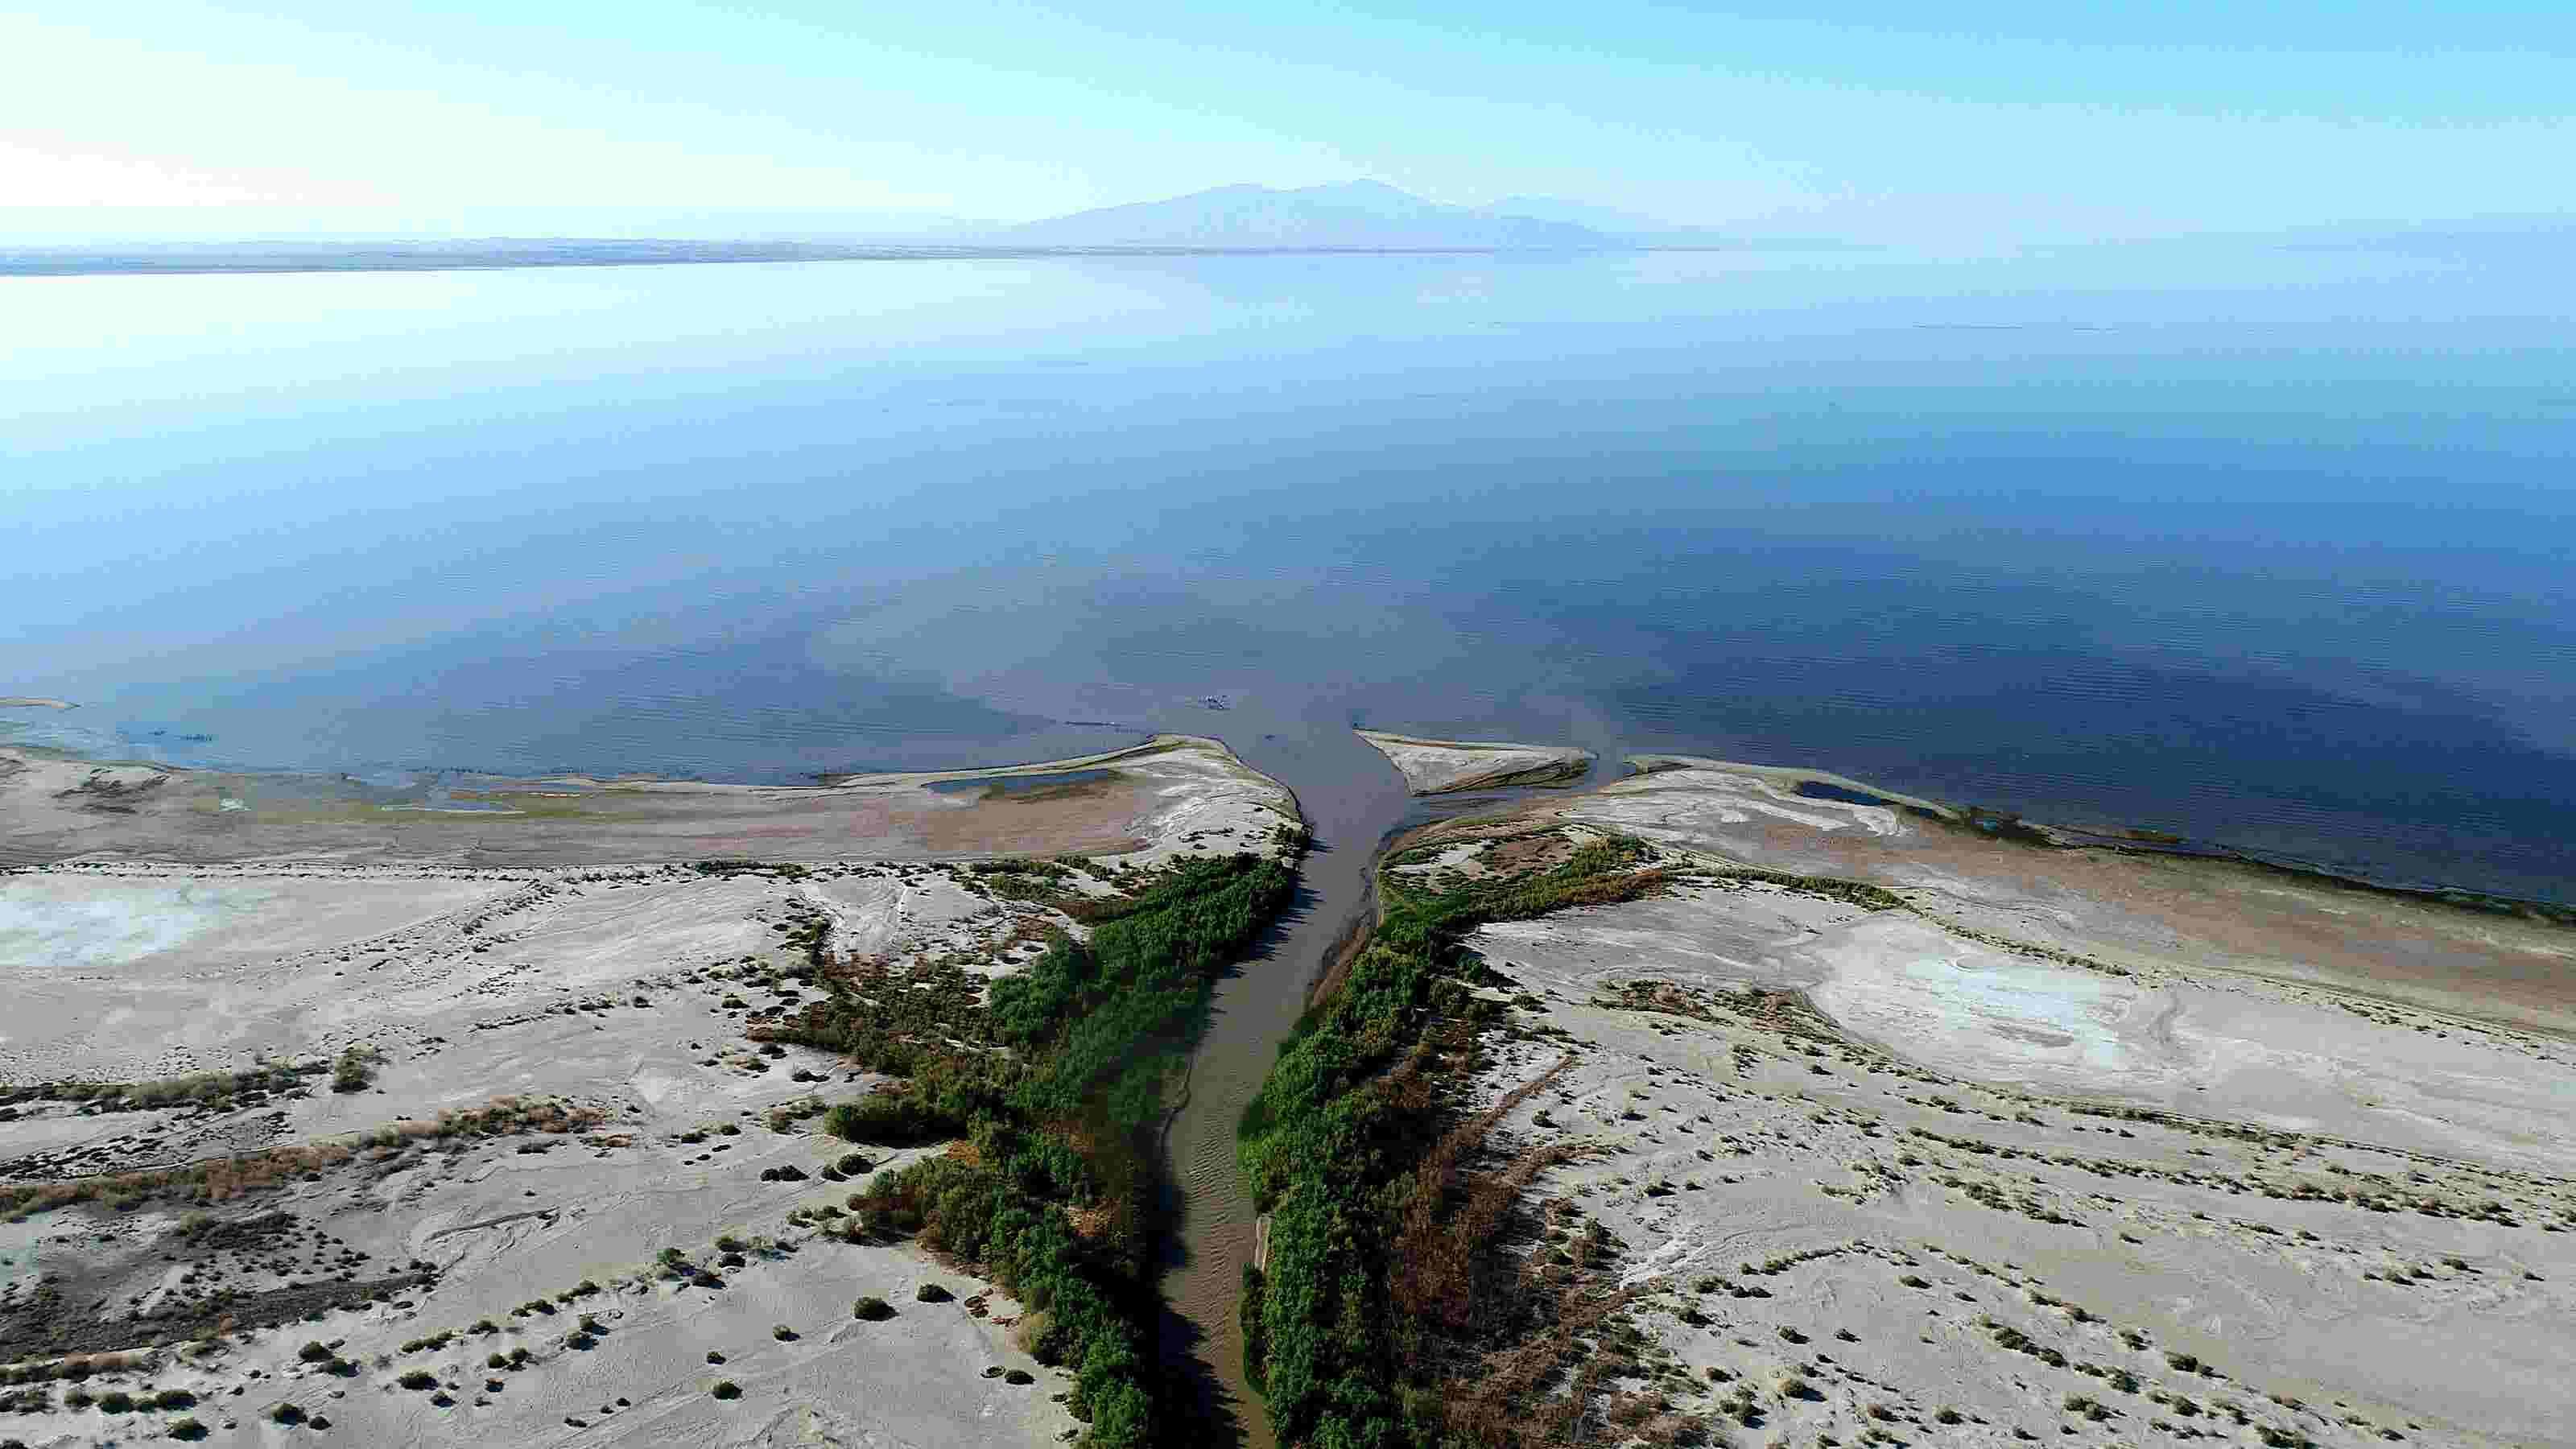 Imperial County declares Salton Sea emergency, demands California take action